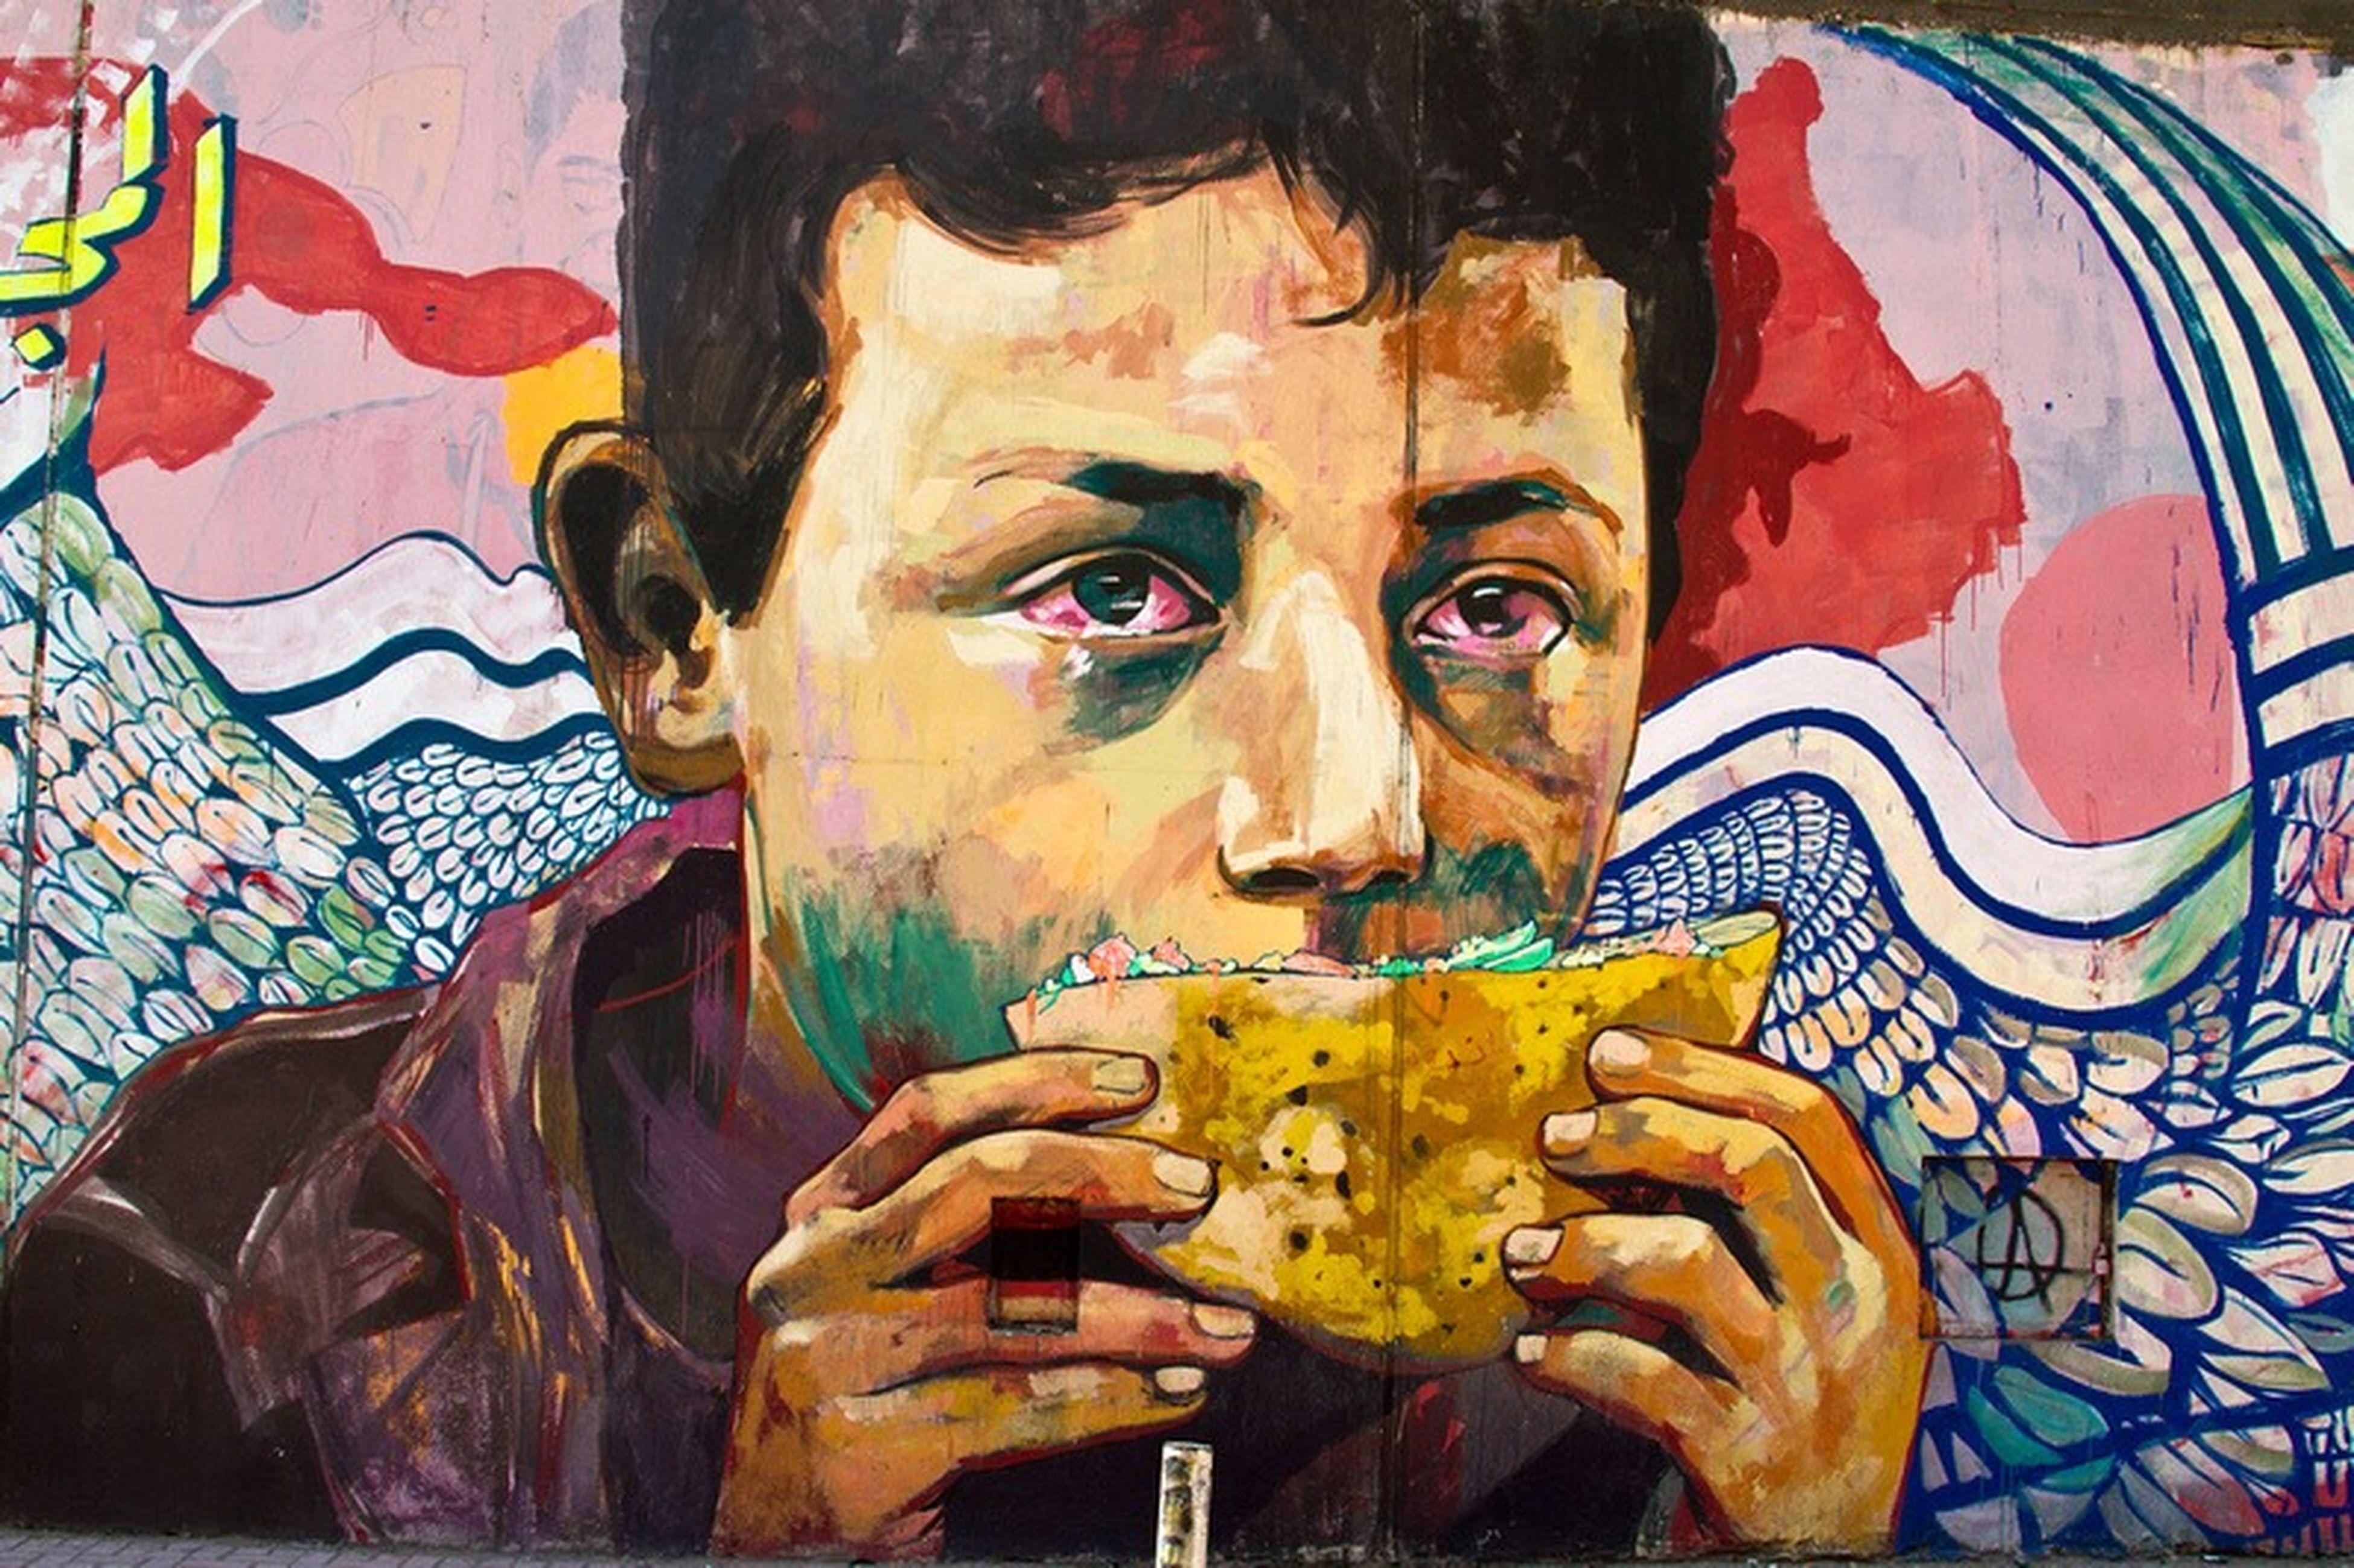 Revolutionary Art in the heart of Cairo. Graffiti Art Streetphotography Streetart Boy Revolution Cairo Egypt Tahrirsquare Colors